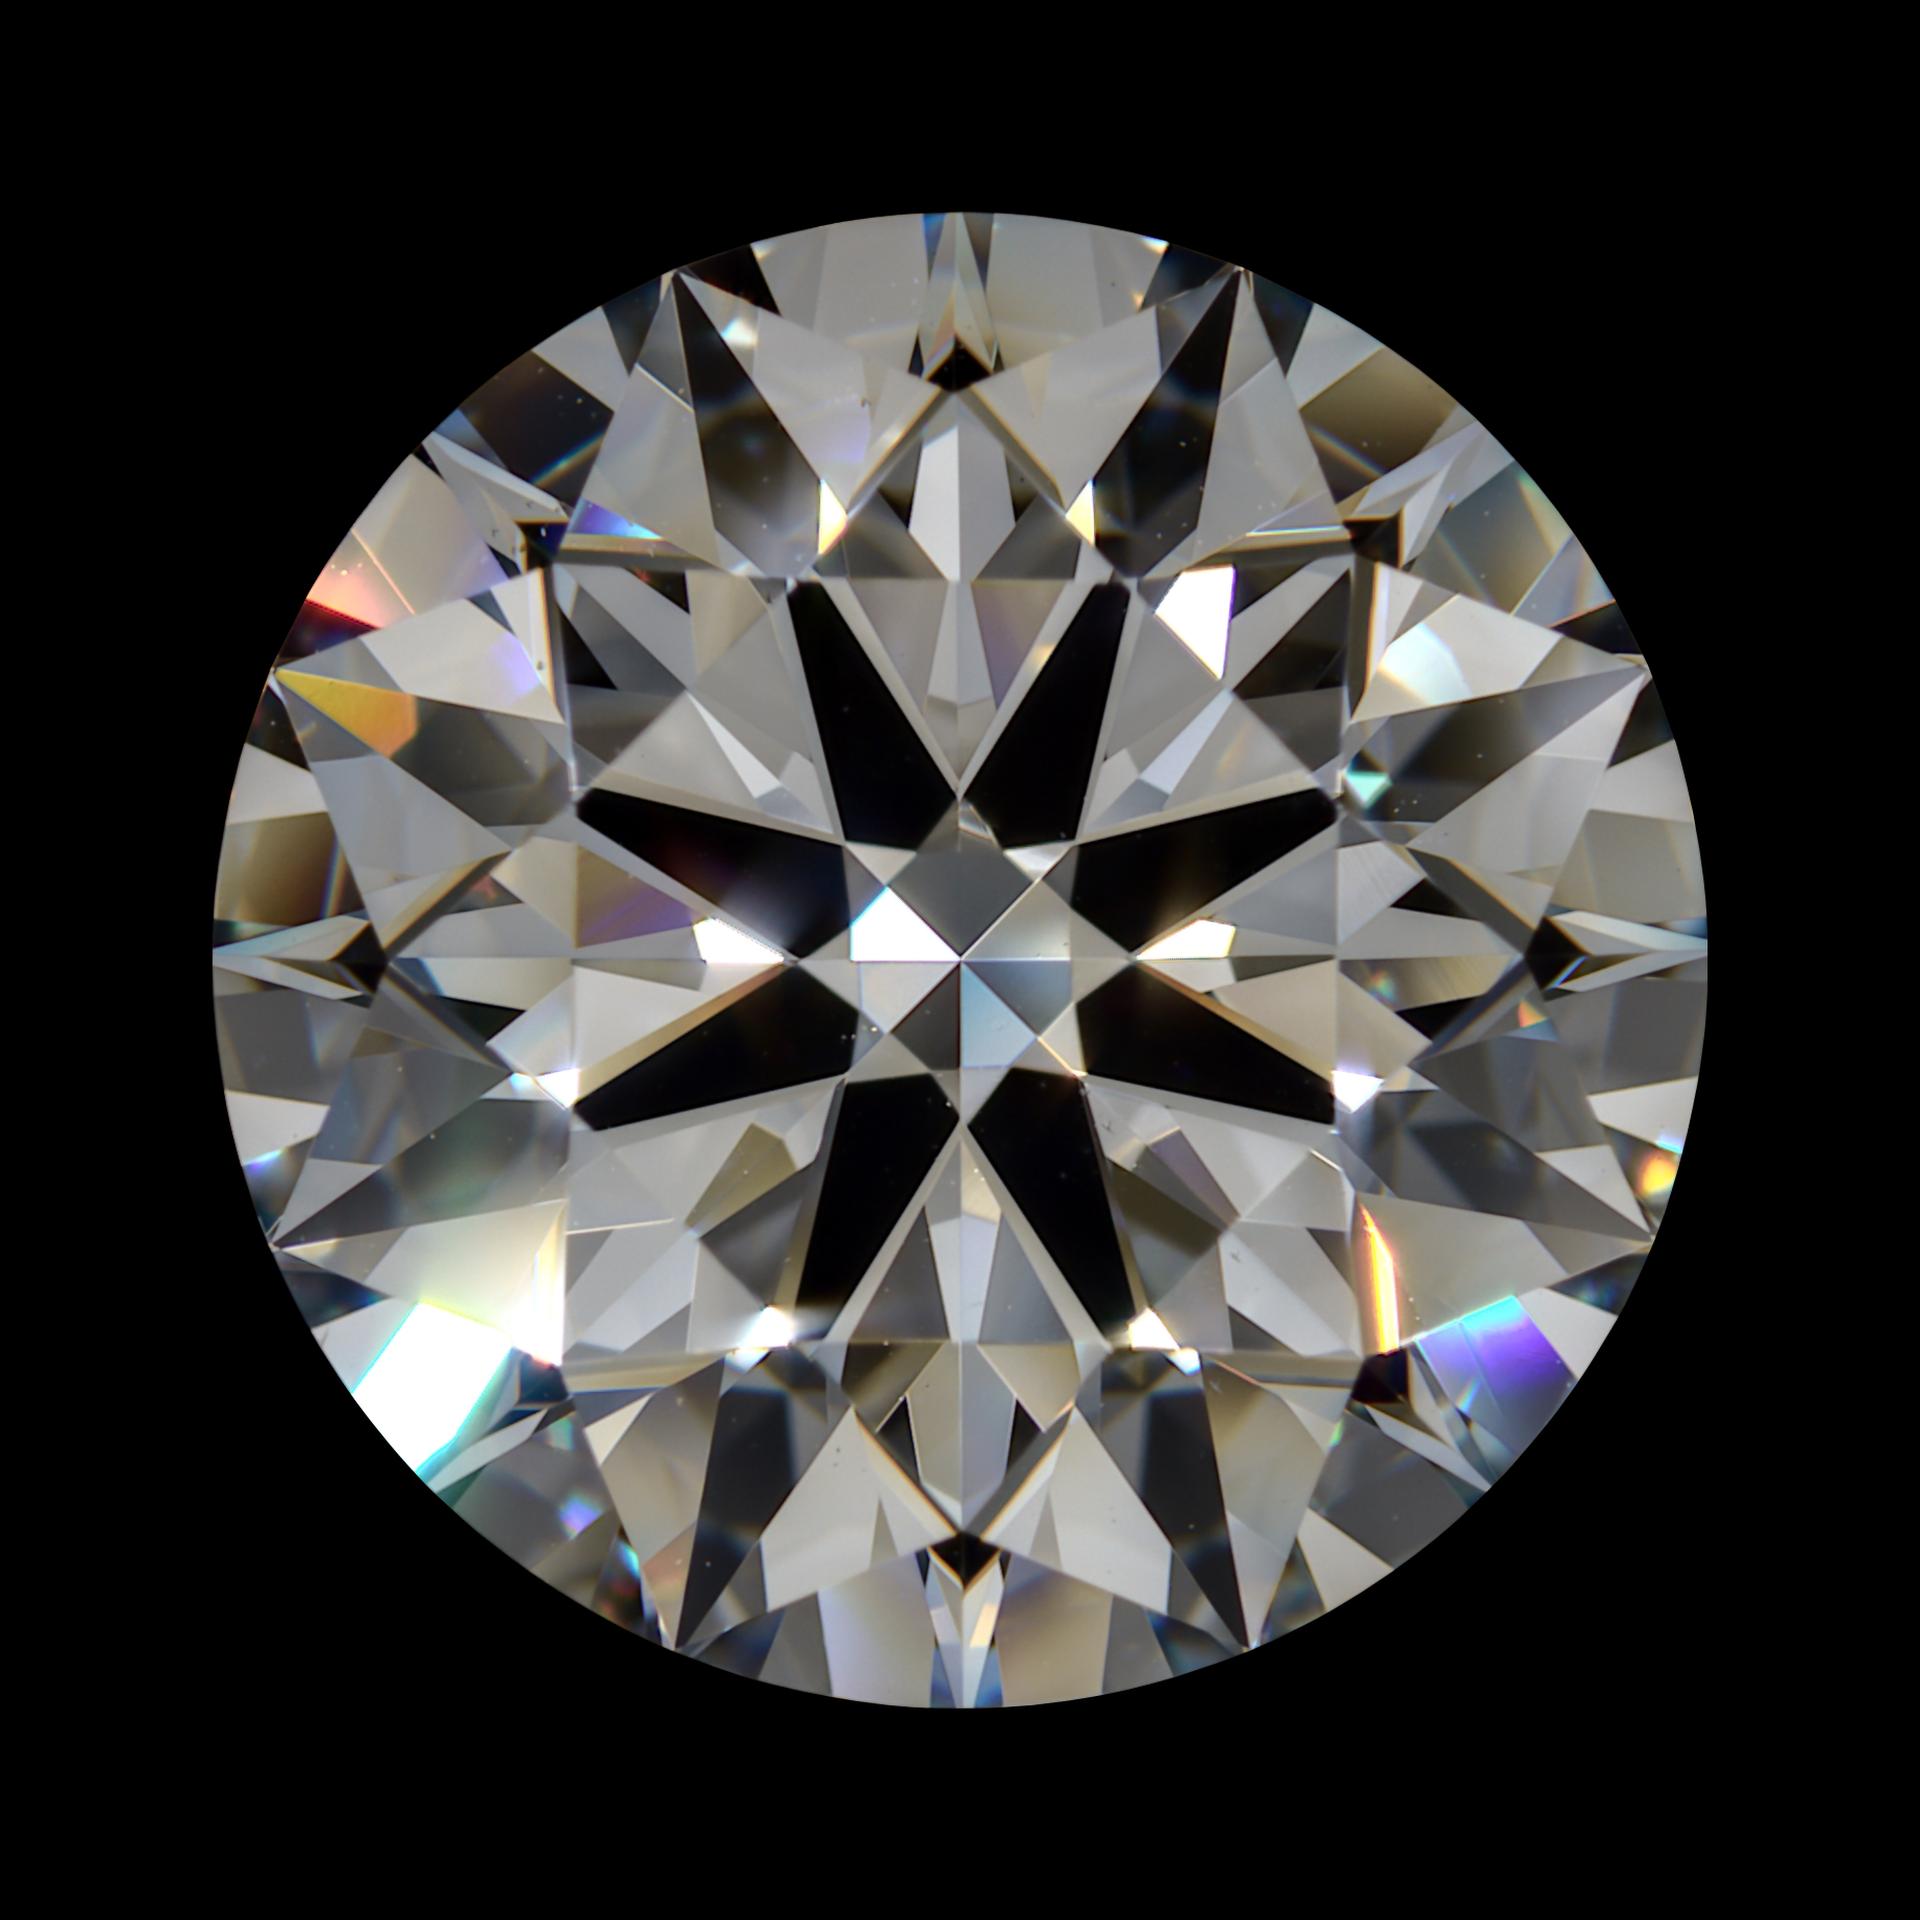 https://cdn.briangavindiamonds.com/files/mp4/BKAGS-104110952001/BKAGS-104110952001-Fire-02.mp4